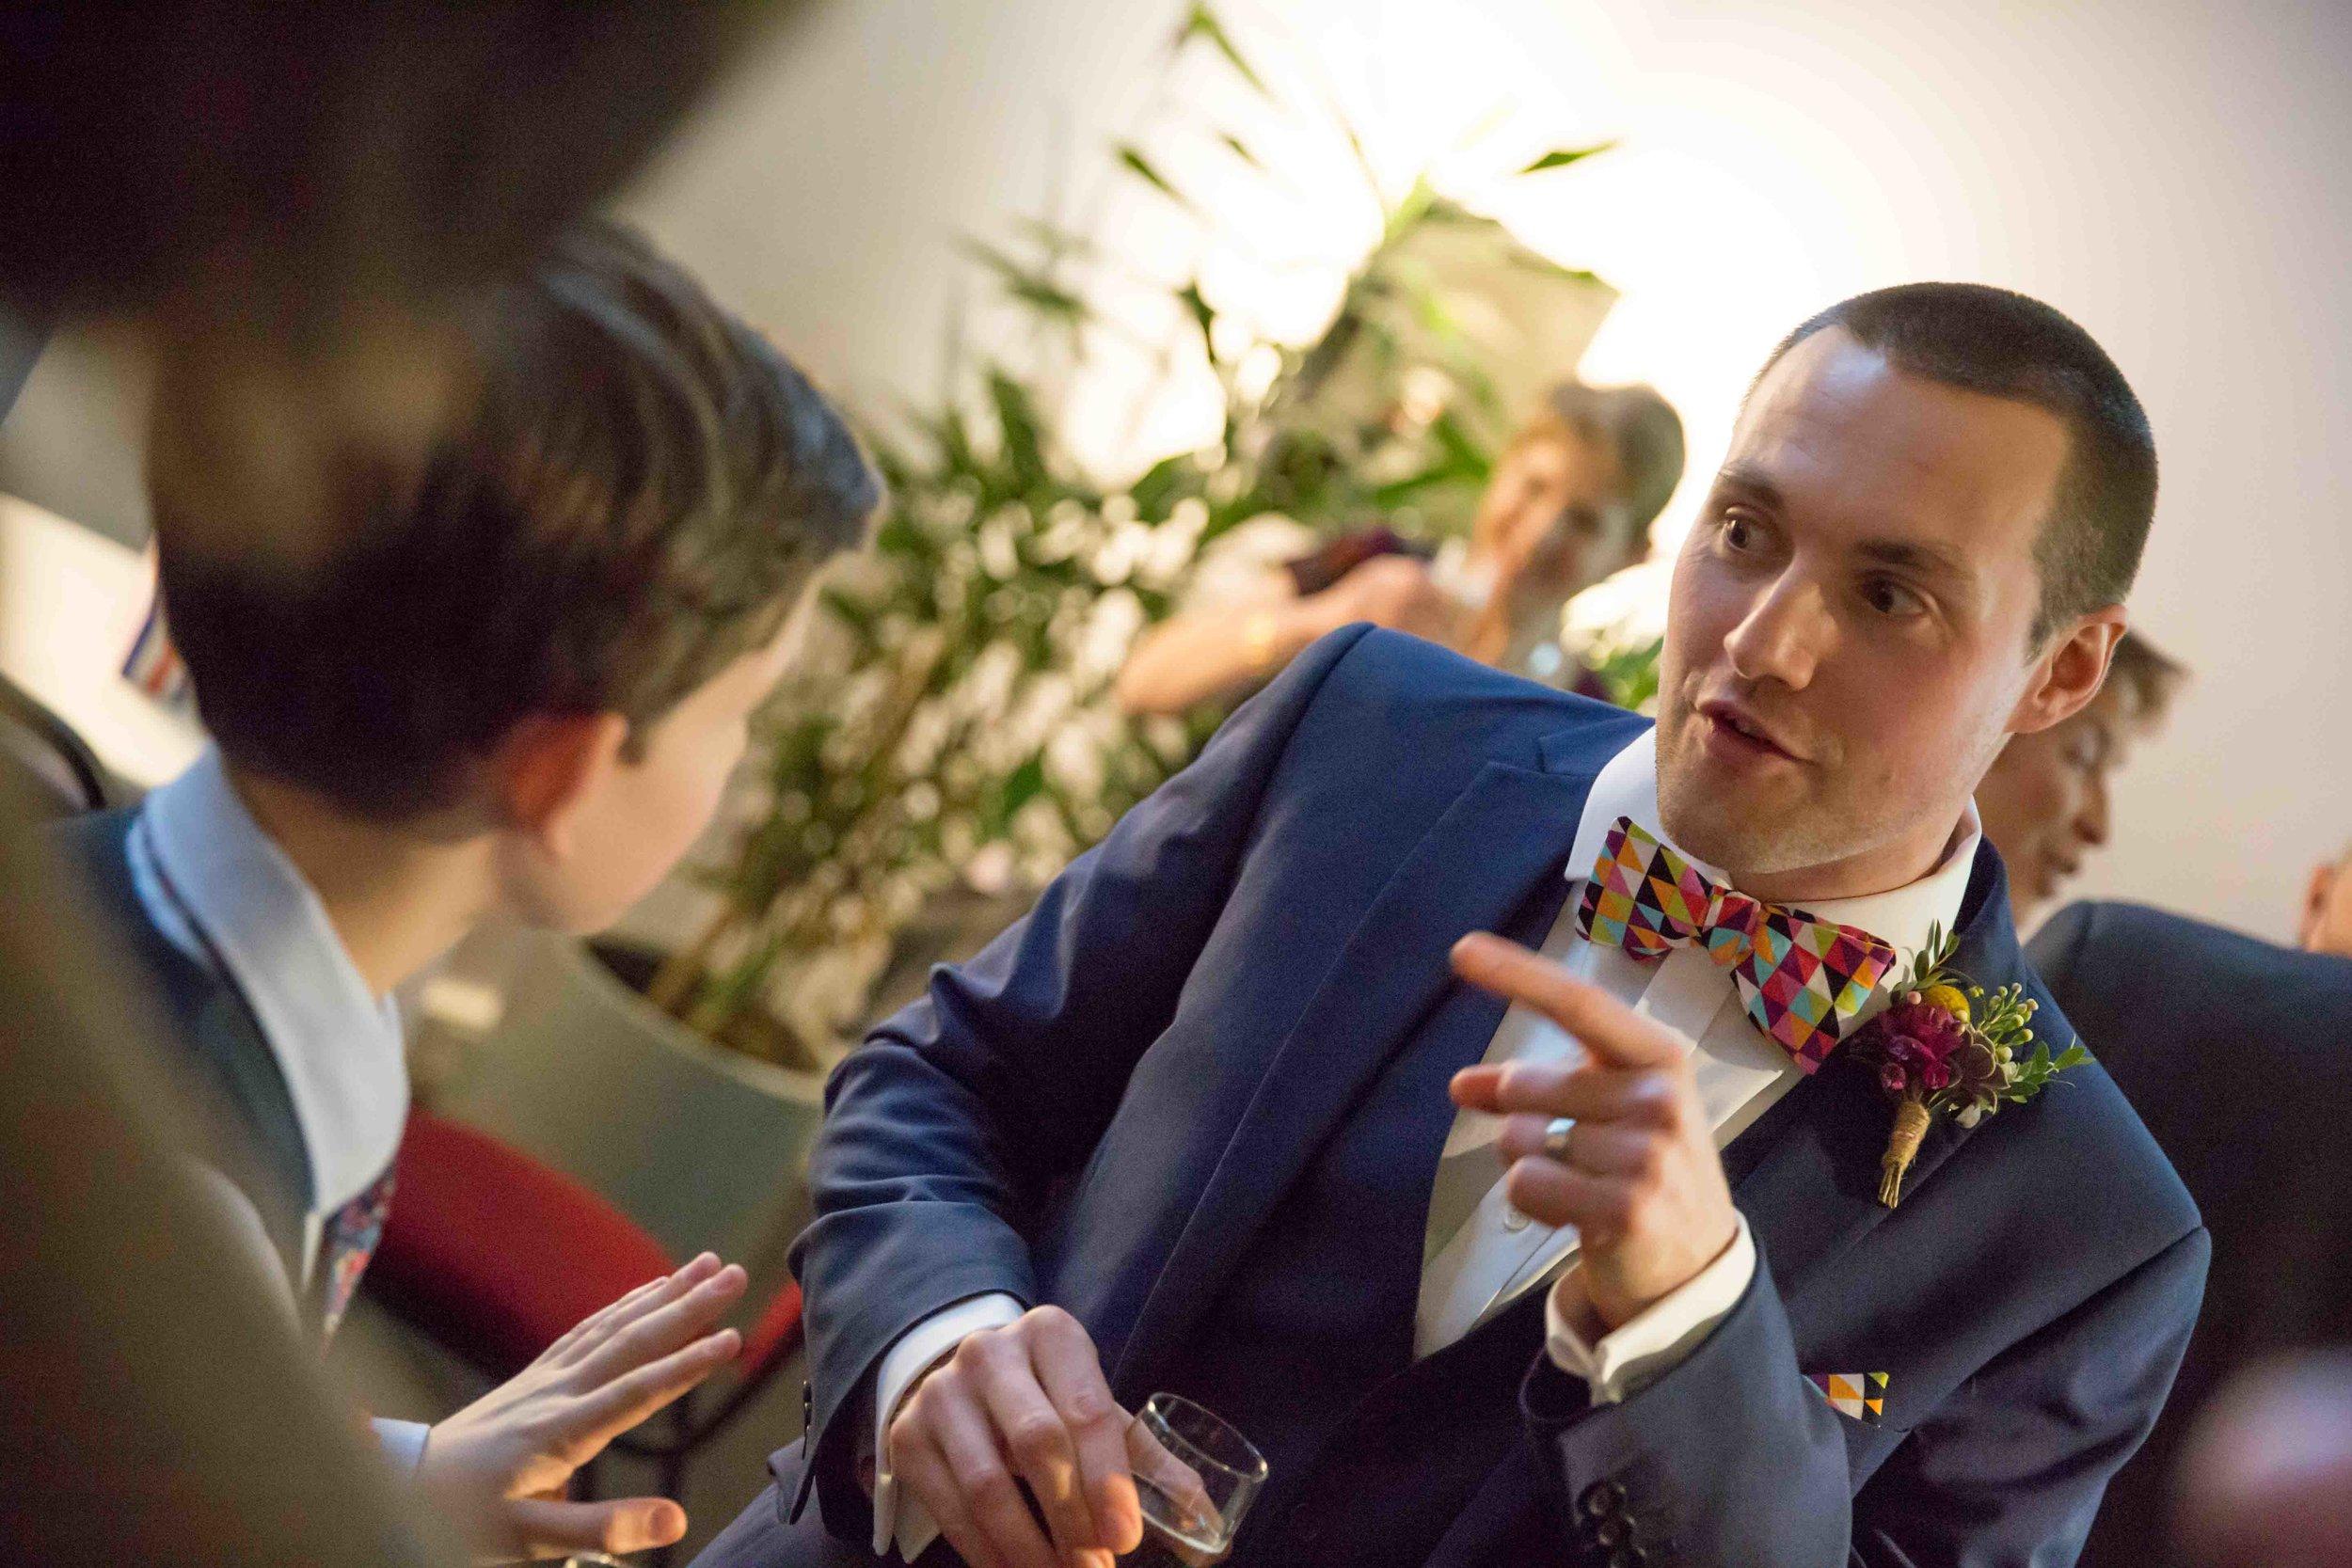 Adam & Faye - Wright Wedding Photography - Bristol Wedding Photographer -169.jpg